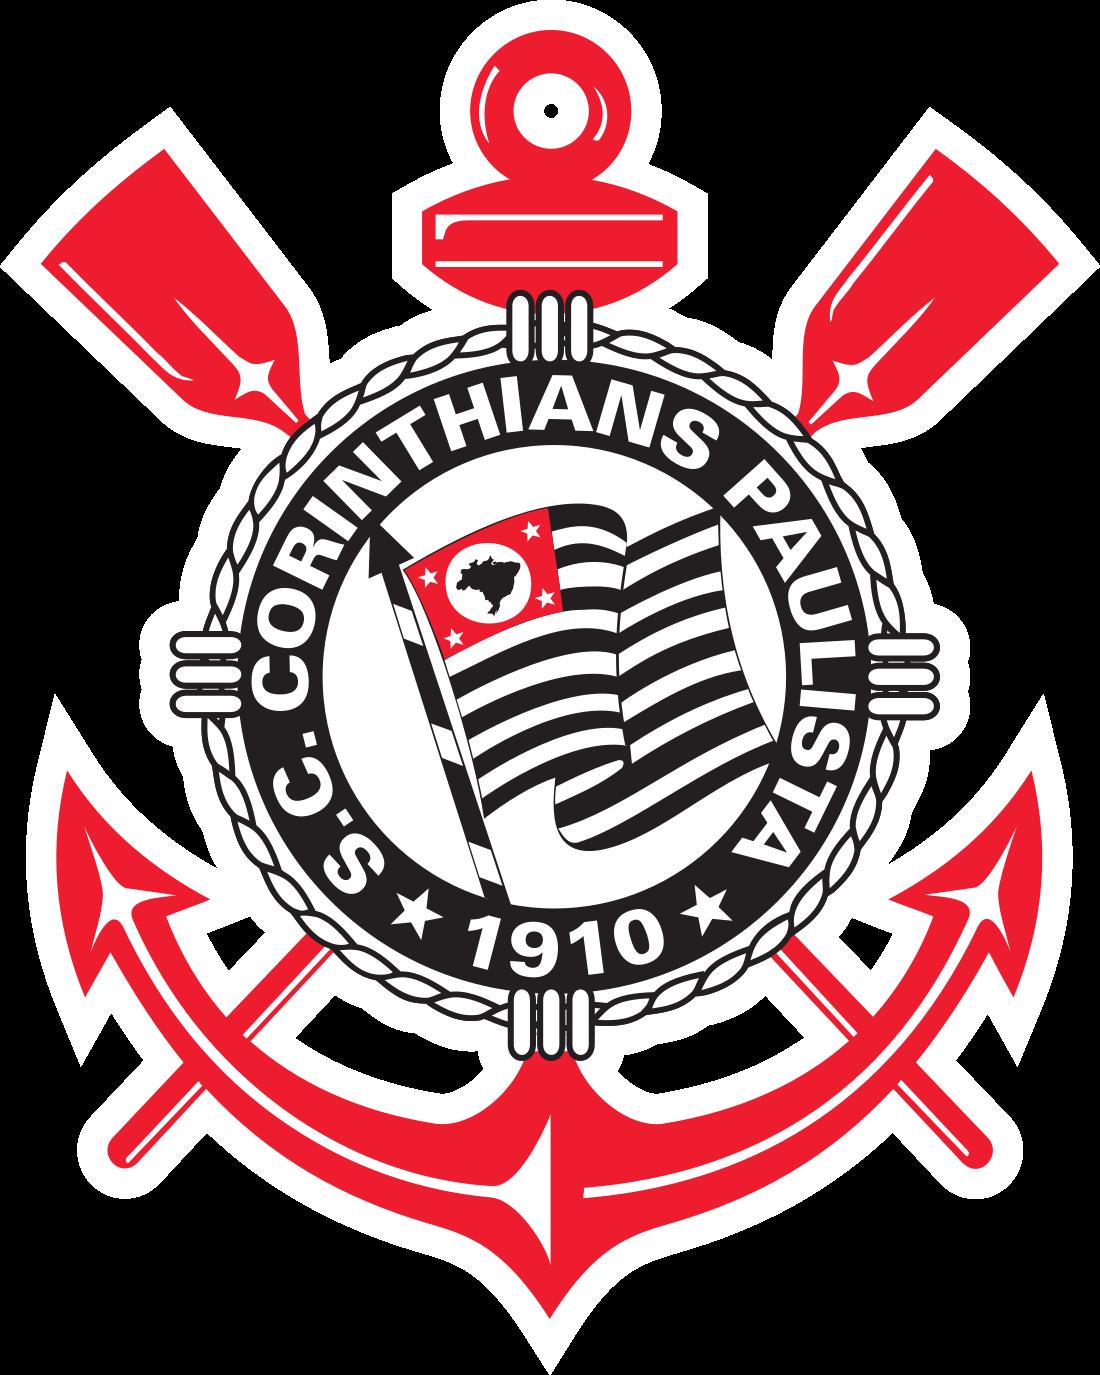 Corinthians logo escudo 3 - Corinthians Logo - Escudo